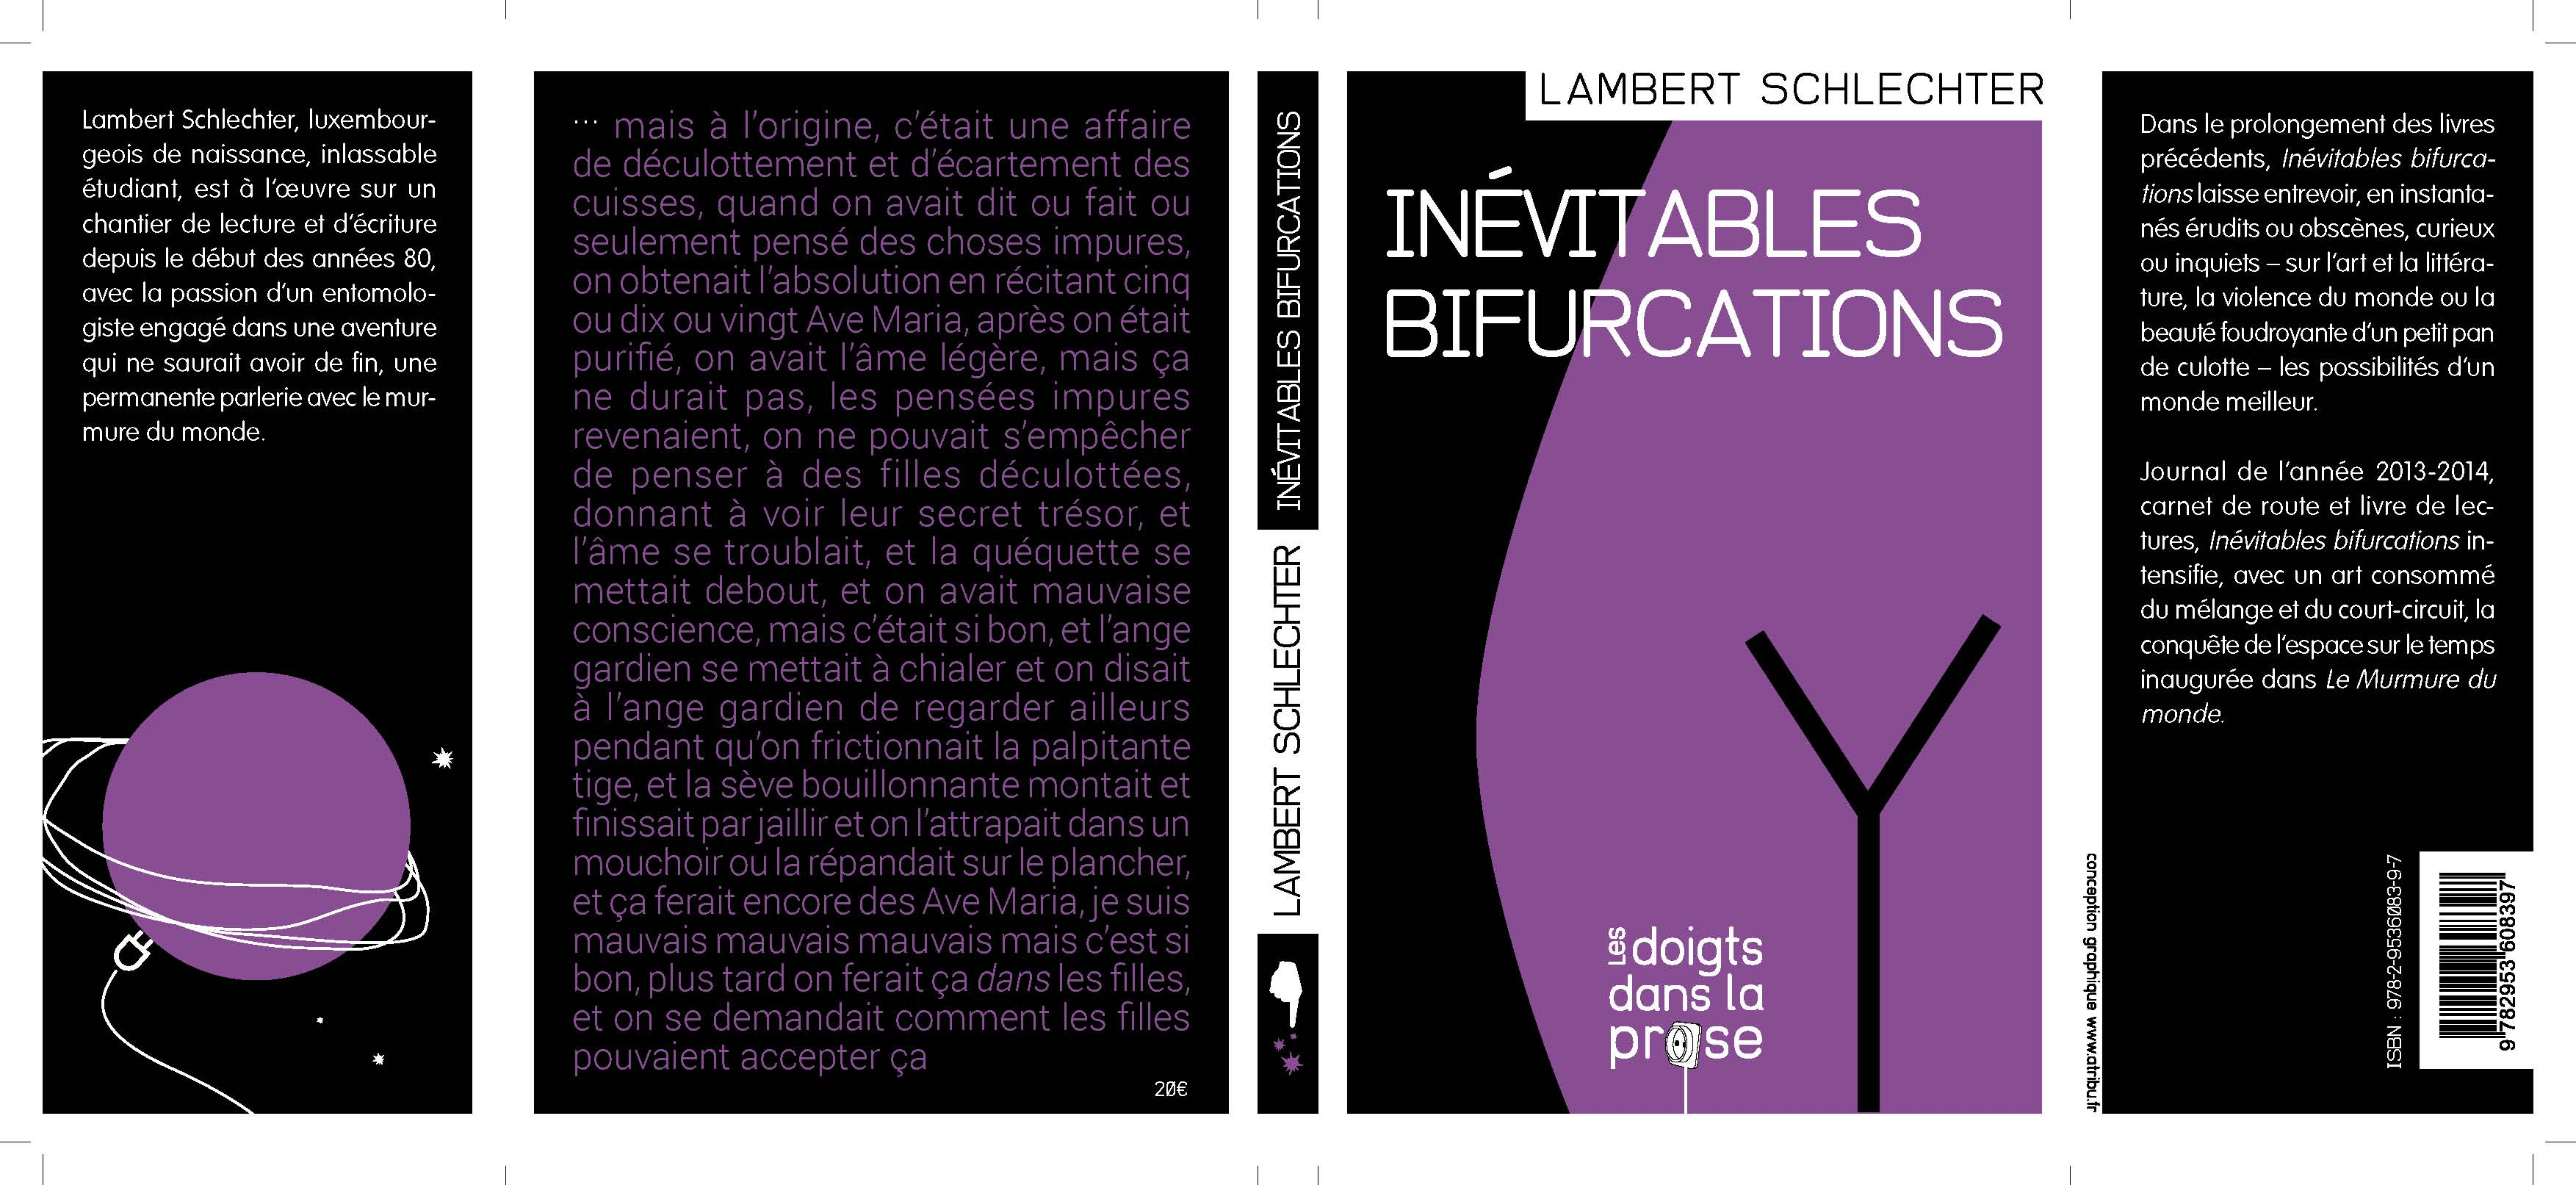 Bifurcations-couverture+rabats_9avril16